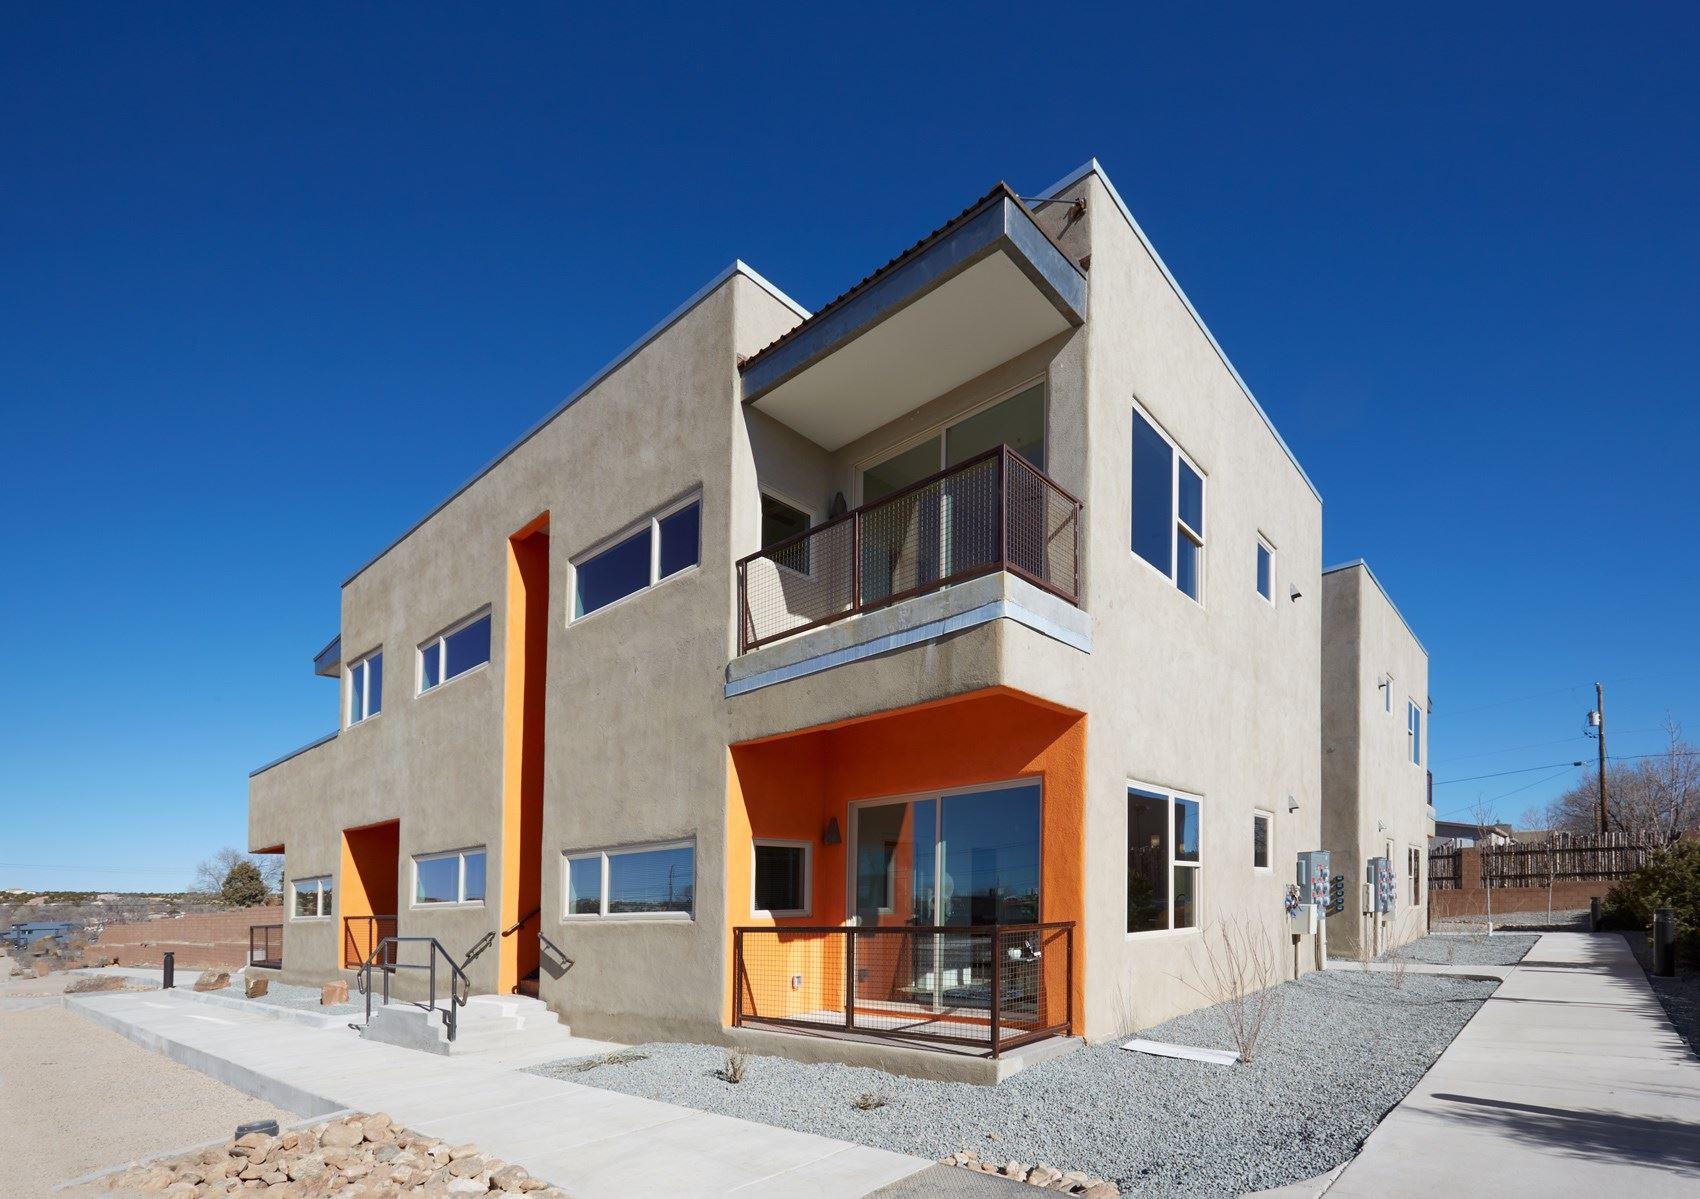 1113 Paseo Corazon #Unit 101, Santa Fe, NM 87507 - #: 202000326